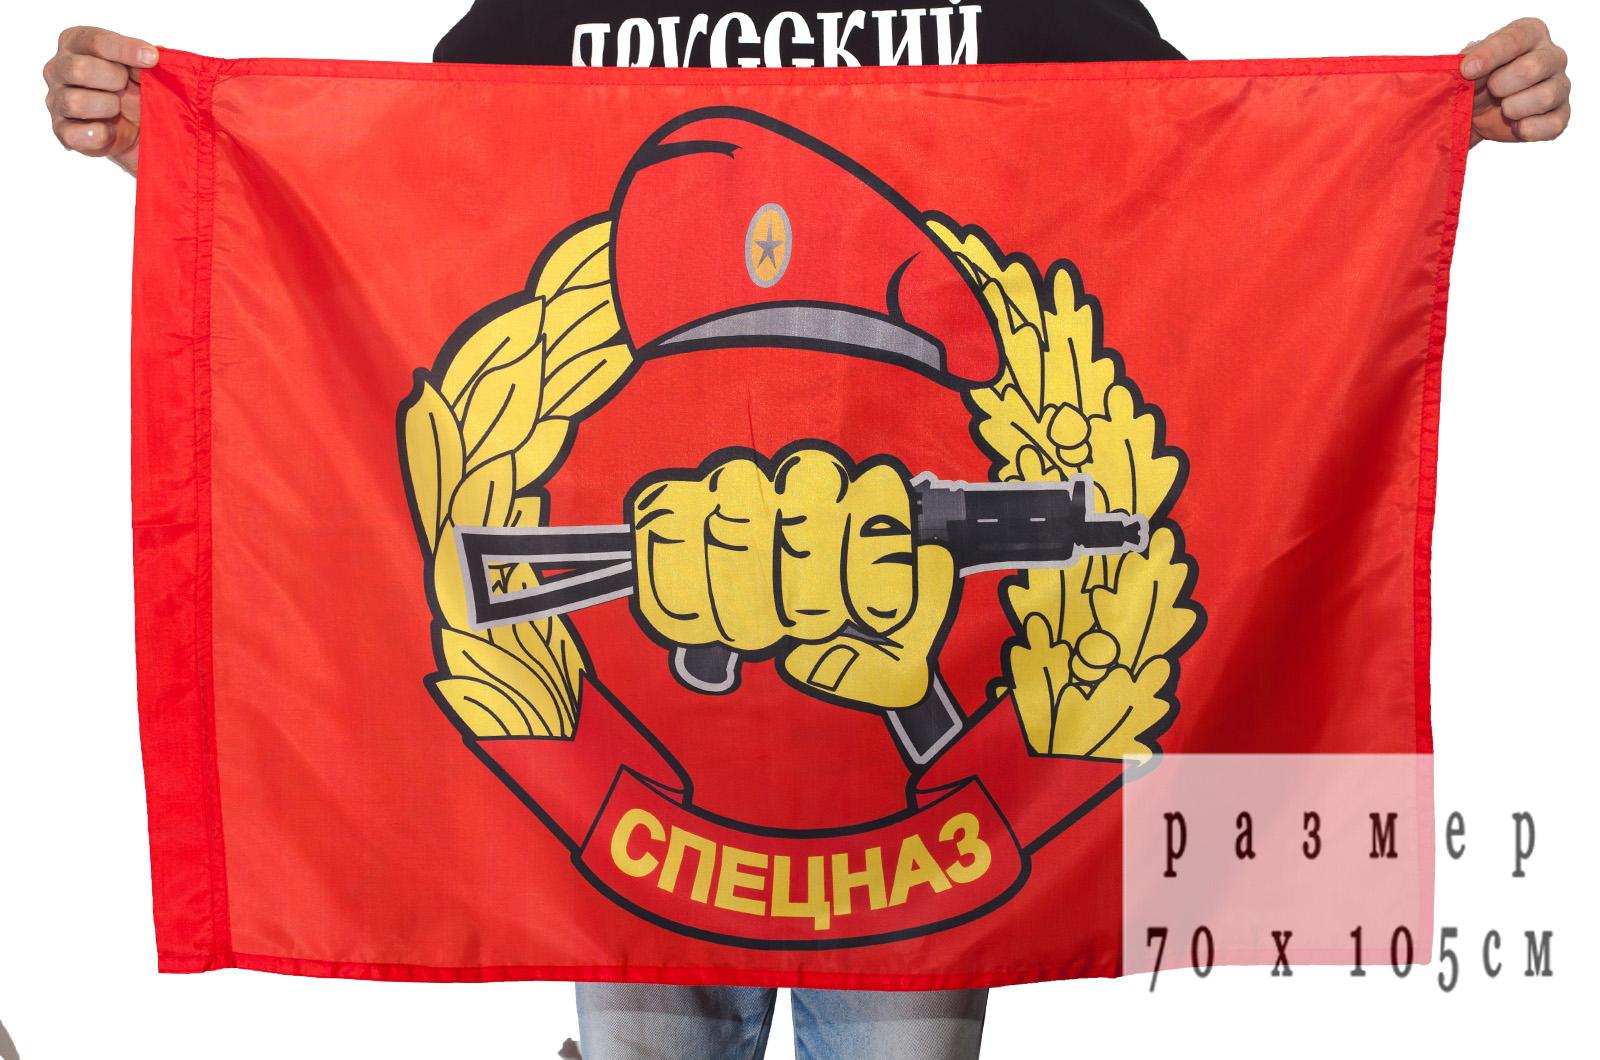 Купить флаг спецназа Внутренних войск МВД РФ 70x105